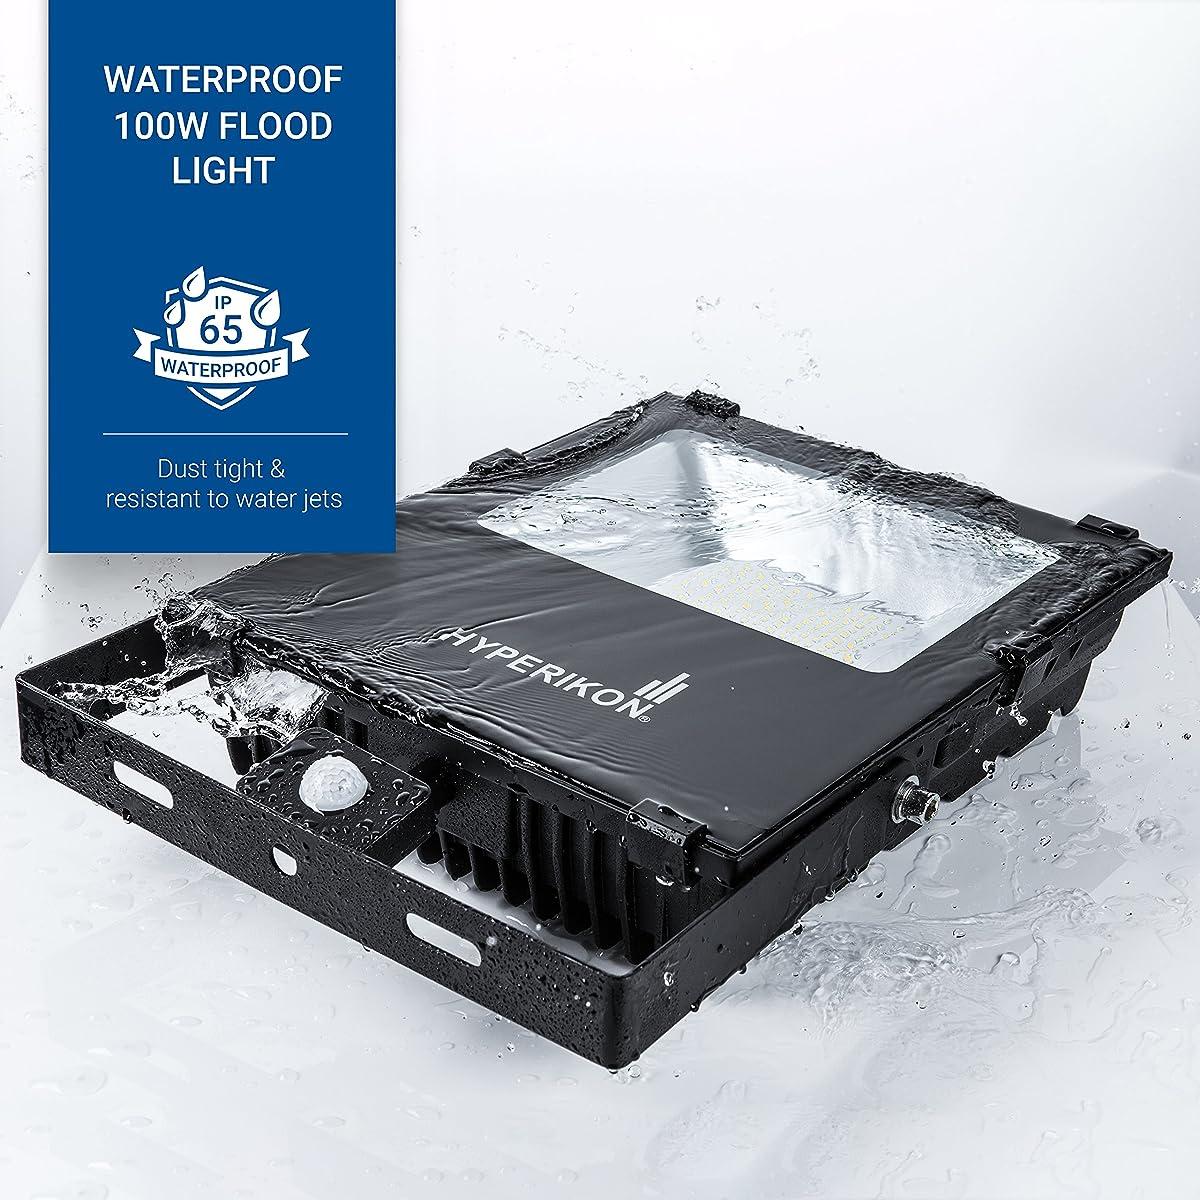 Hyperikon Outdoor LED Flood Light with Motion Sensor, 100W (400W Equivalent) 10000 Lumens, 5000K, LED Security Light, 120v, IP65 Waterproof - For Security, Light Poles, Events